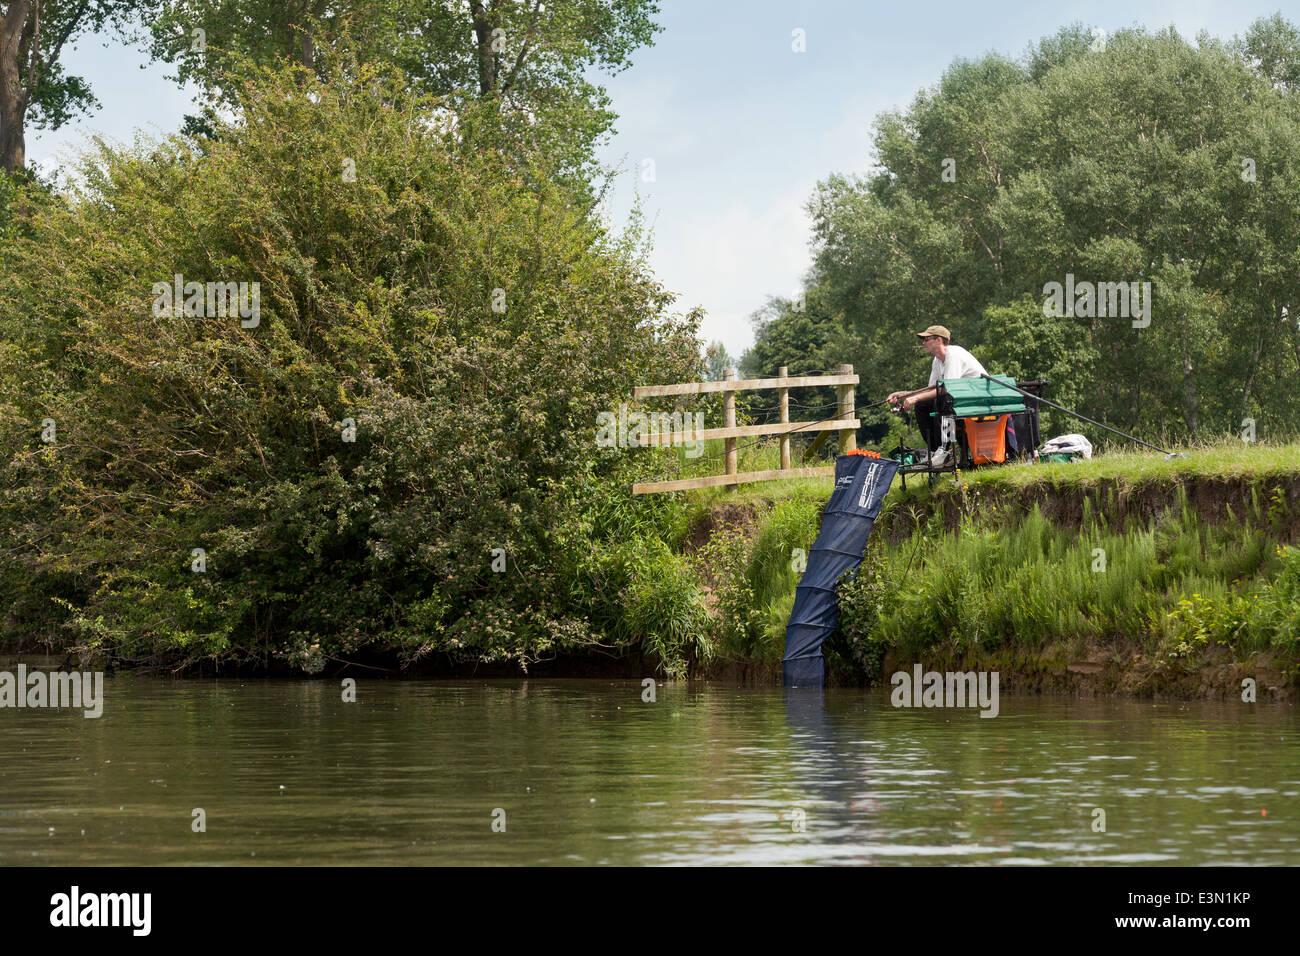 Angler angling, the River Thames at Wallingford, Oxfordshire England UK - Stock Image